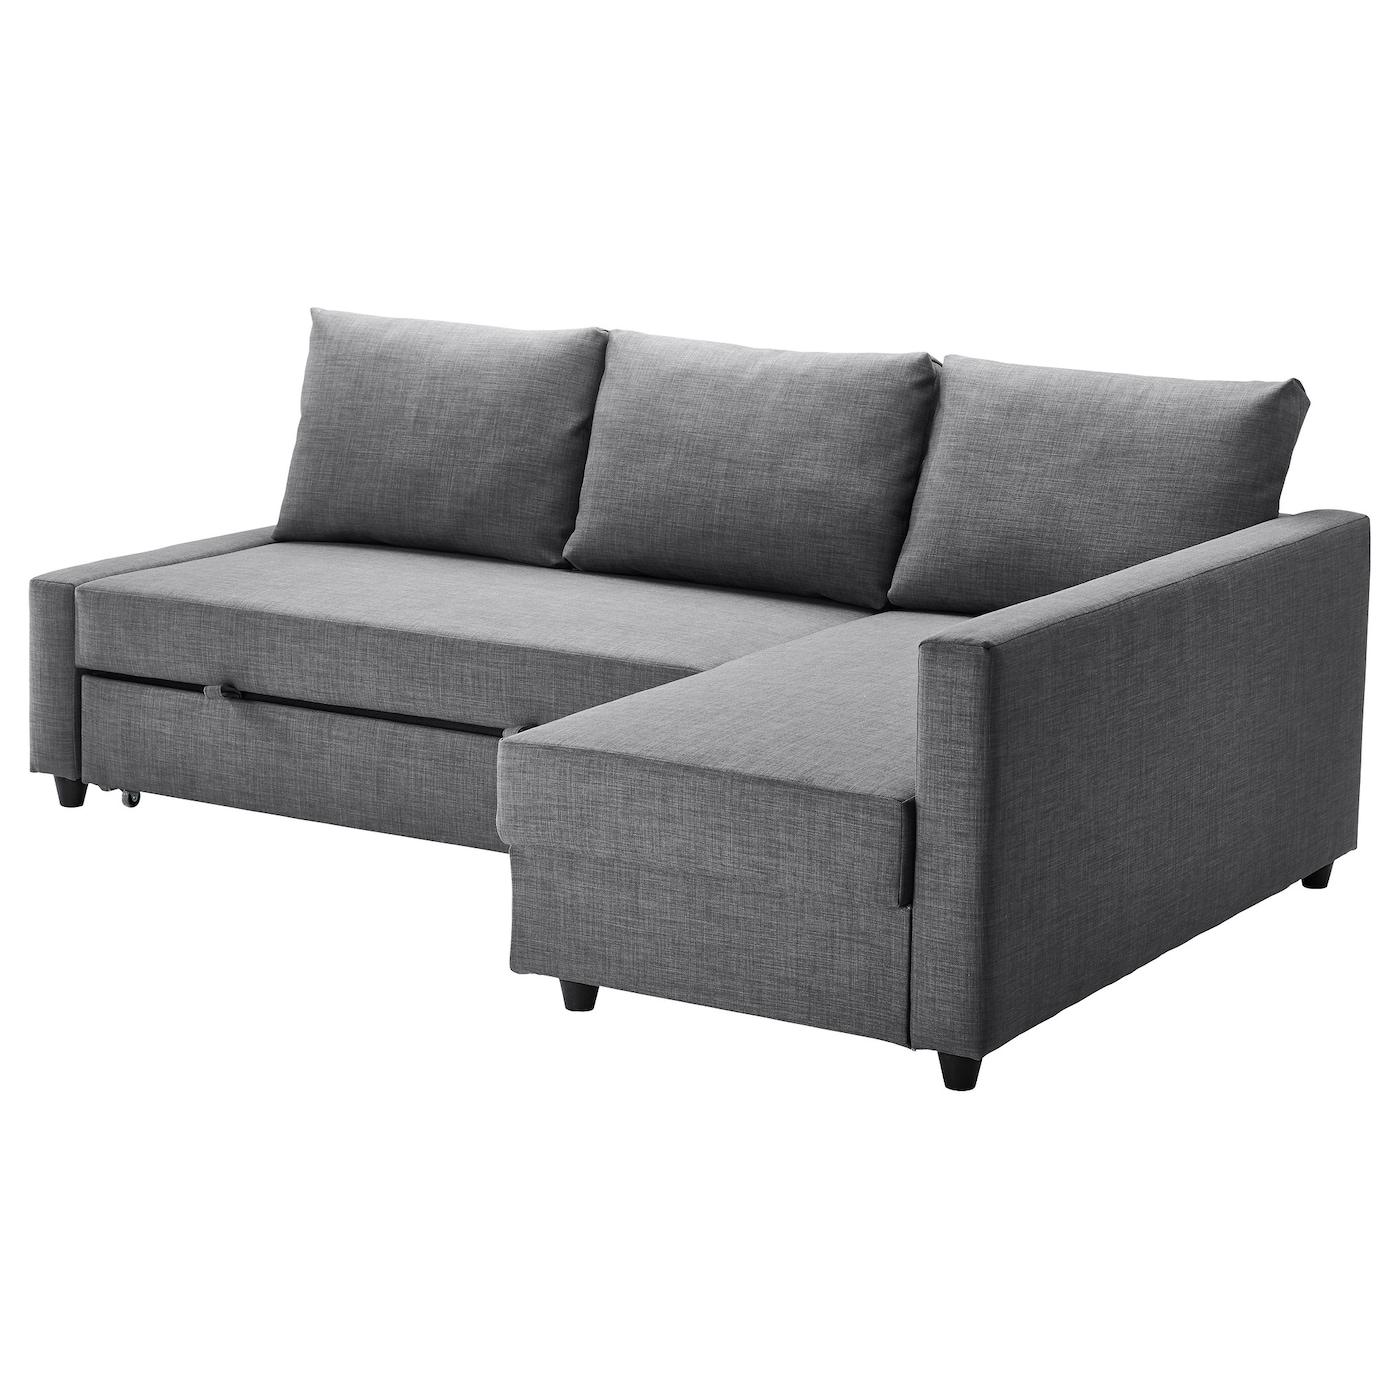 Sof� cama esquina con almacenaje, Skiftebo gris oscuro